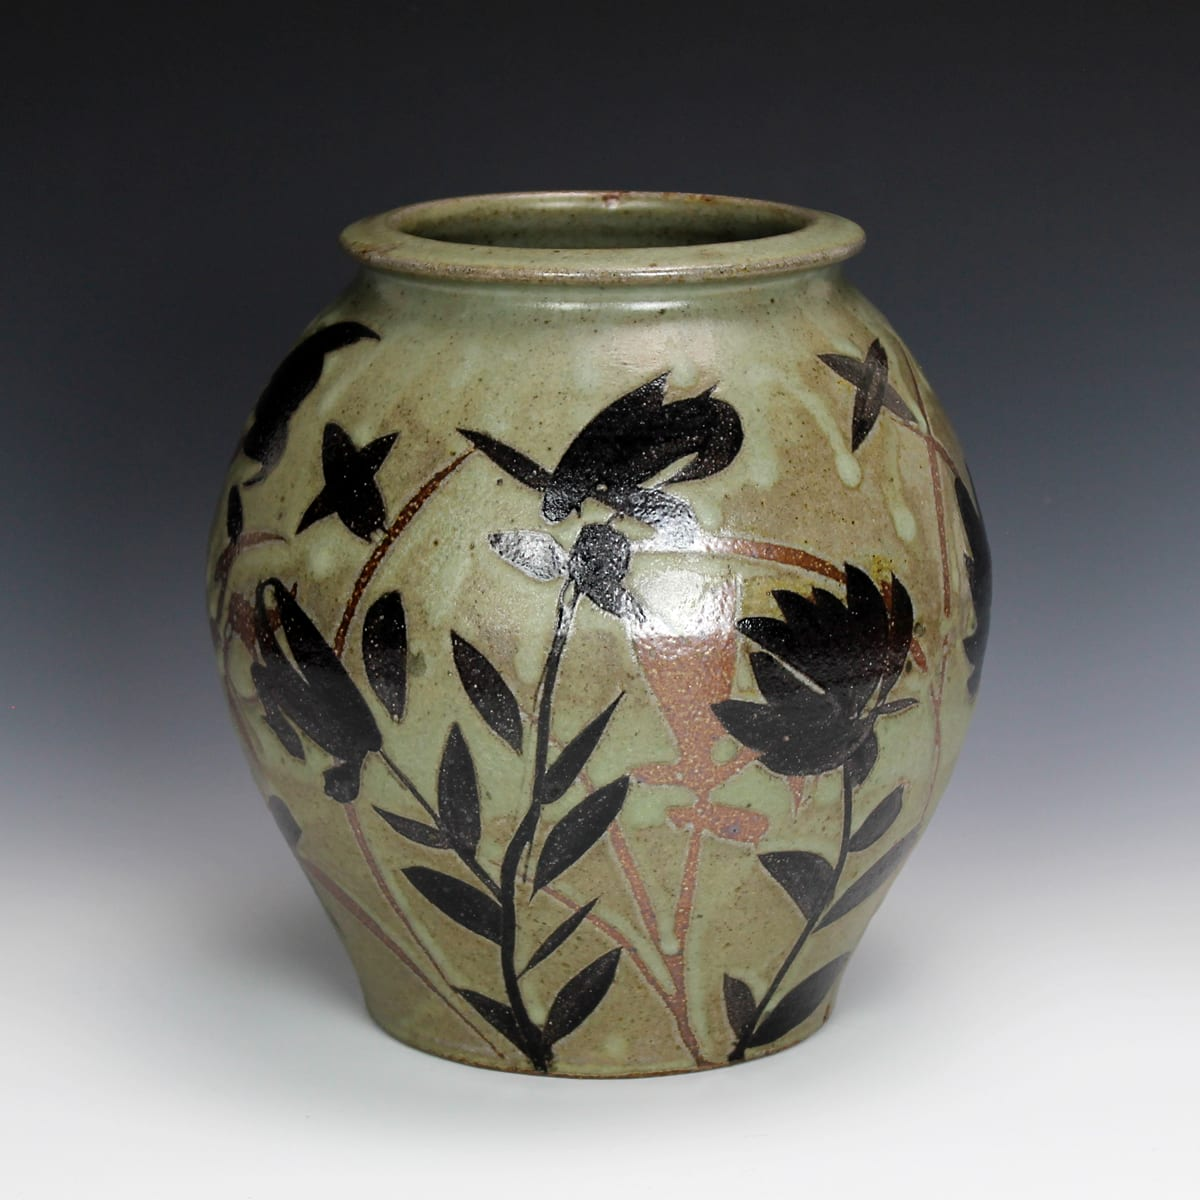 Michael Kline, Jar, 2020